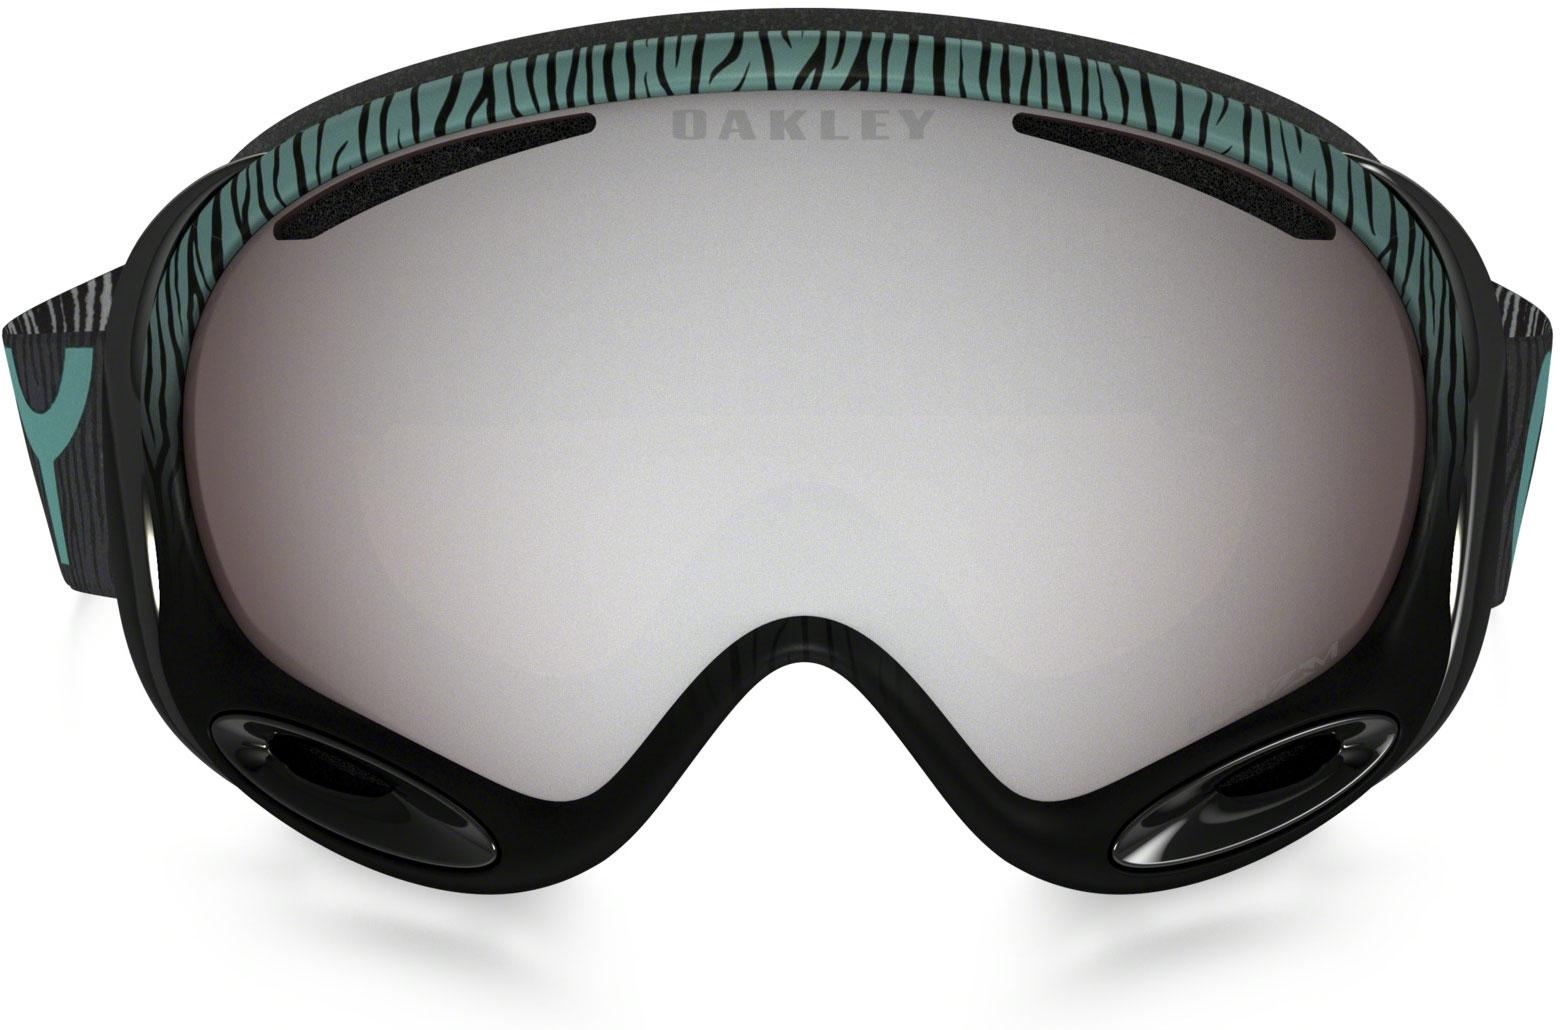 2016 oakley goggles iic3  OAKLEY A-FRAME 20 Goggle 2016 factory pilot bengal mint/prizm black iridium